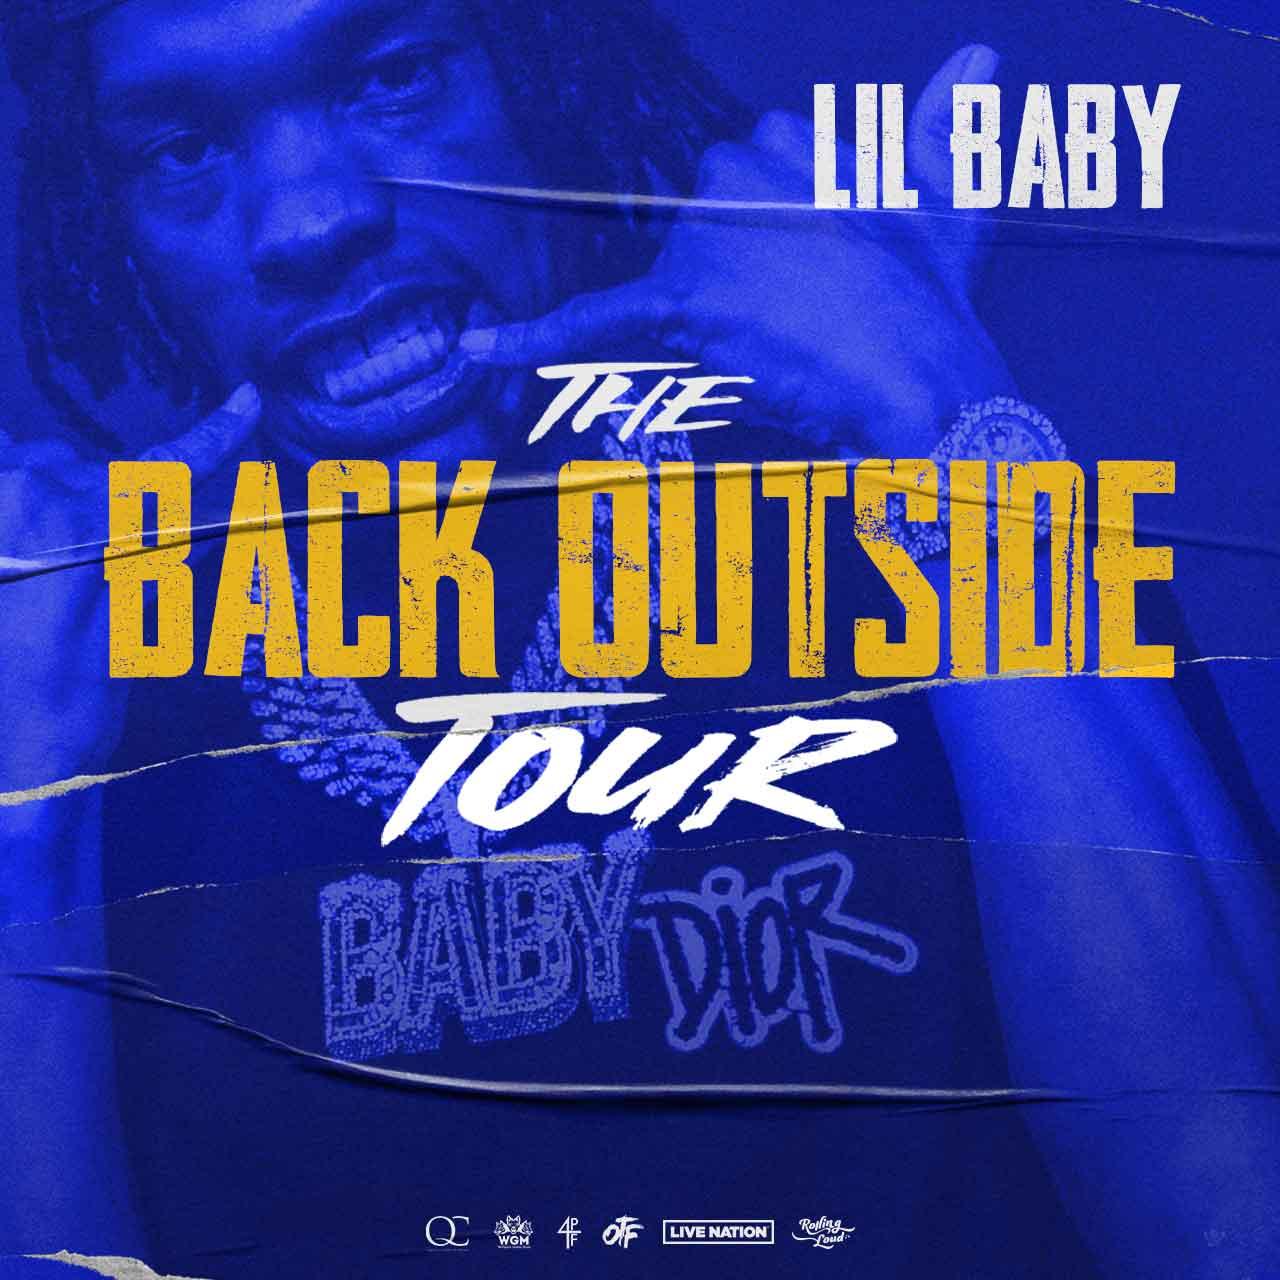 The Back Outside Tour